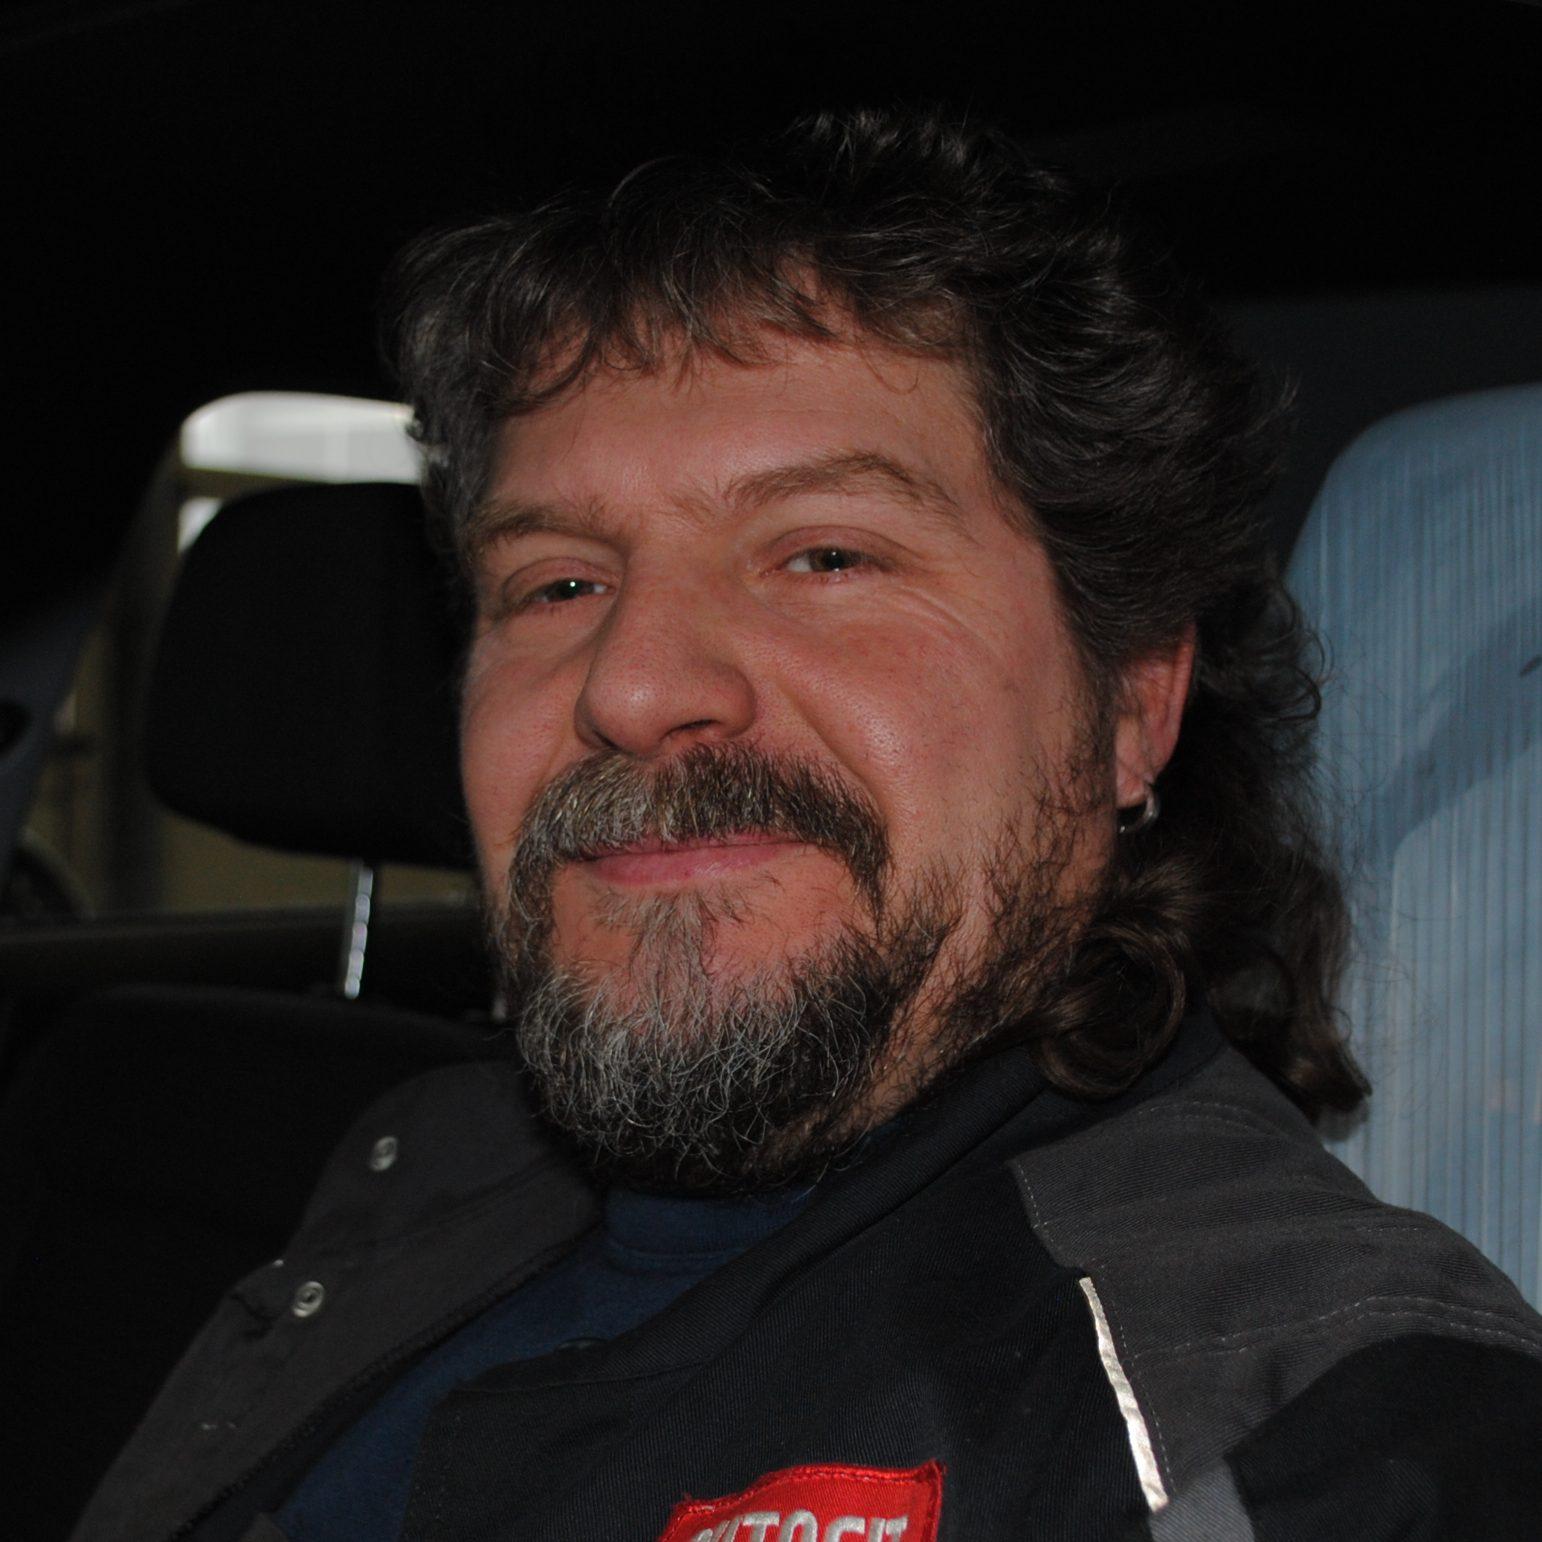 Markus Stegmüller